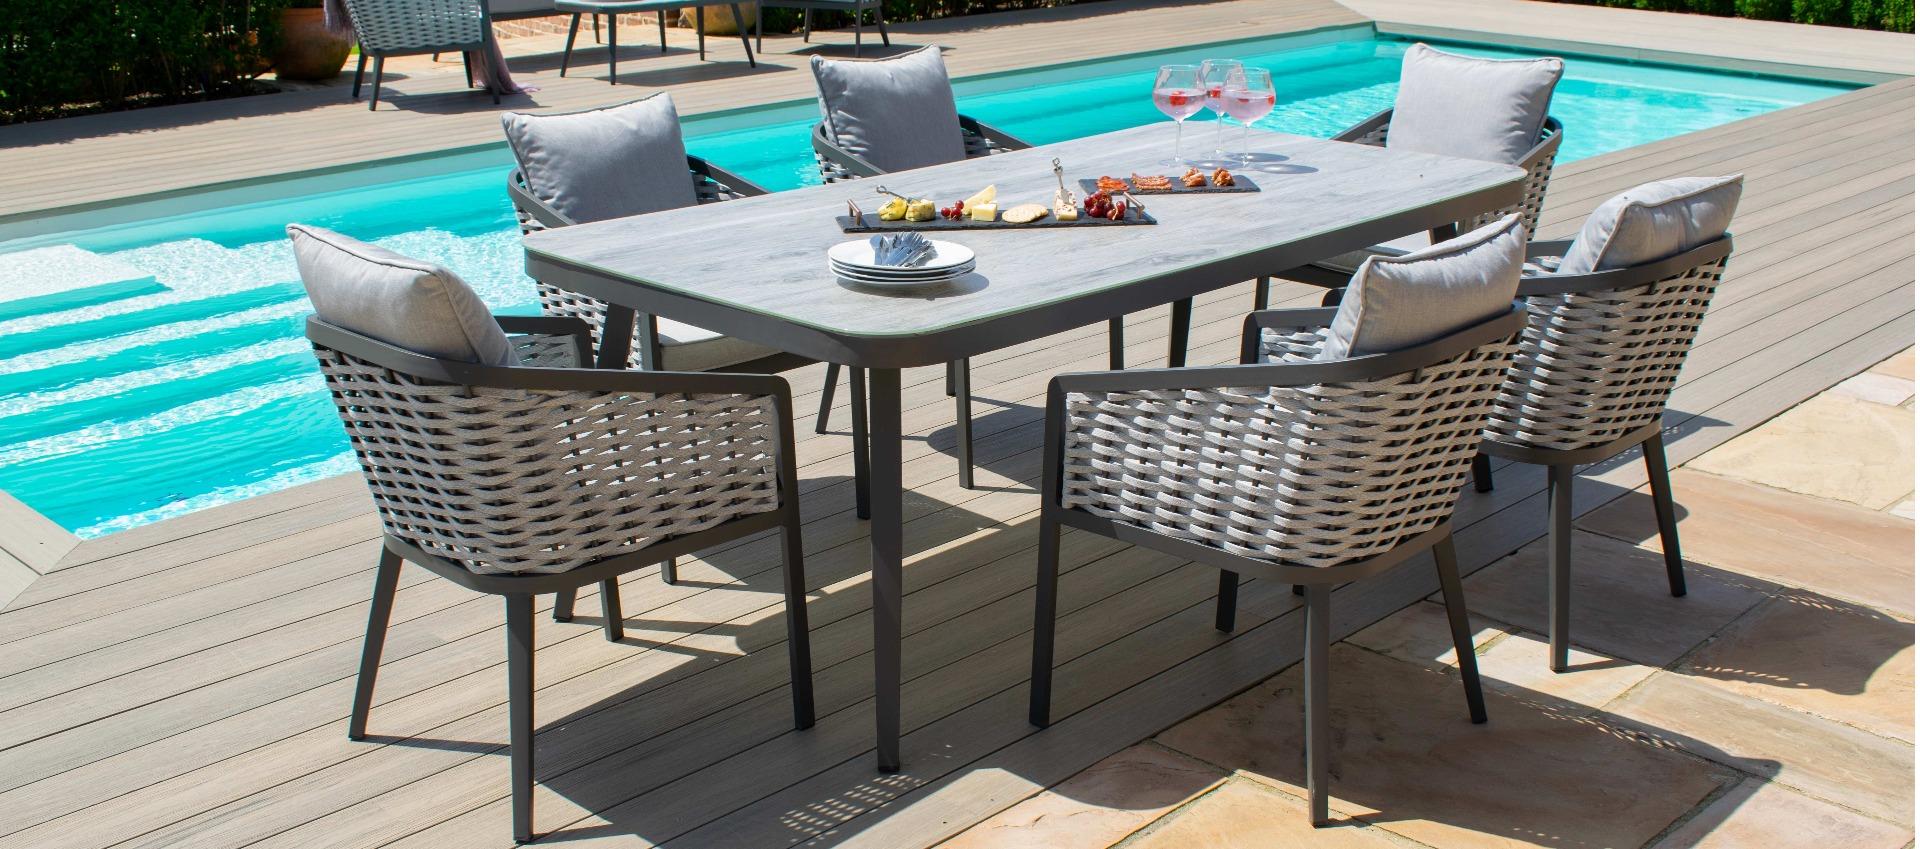 Maze - Portofino 6 Seat Rectangular Dining Set - Rope Weave